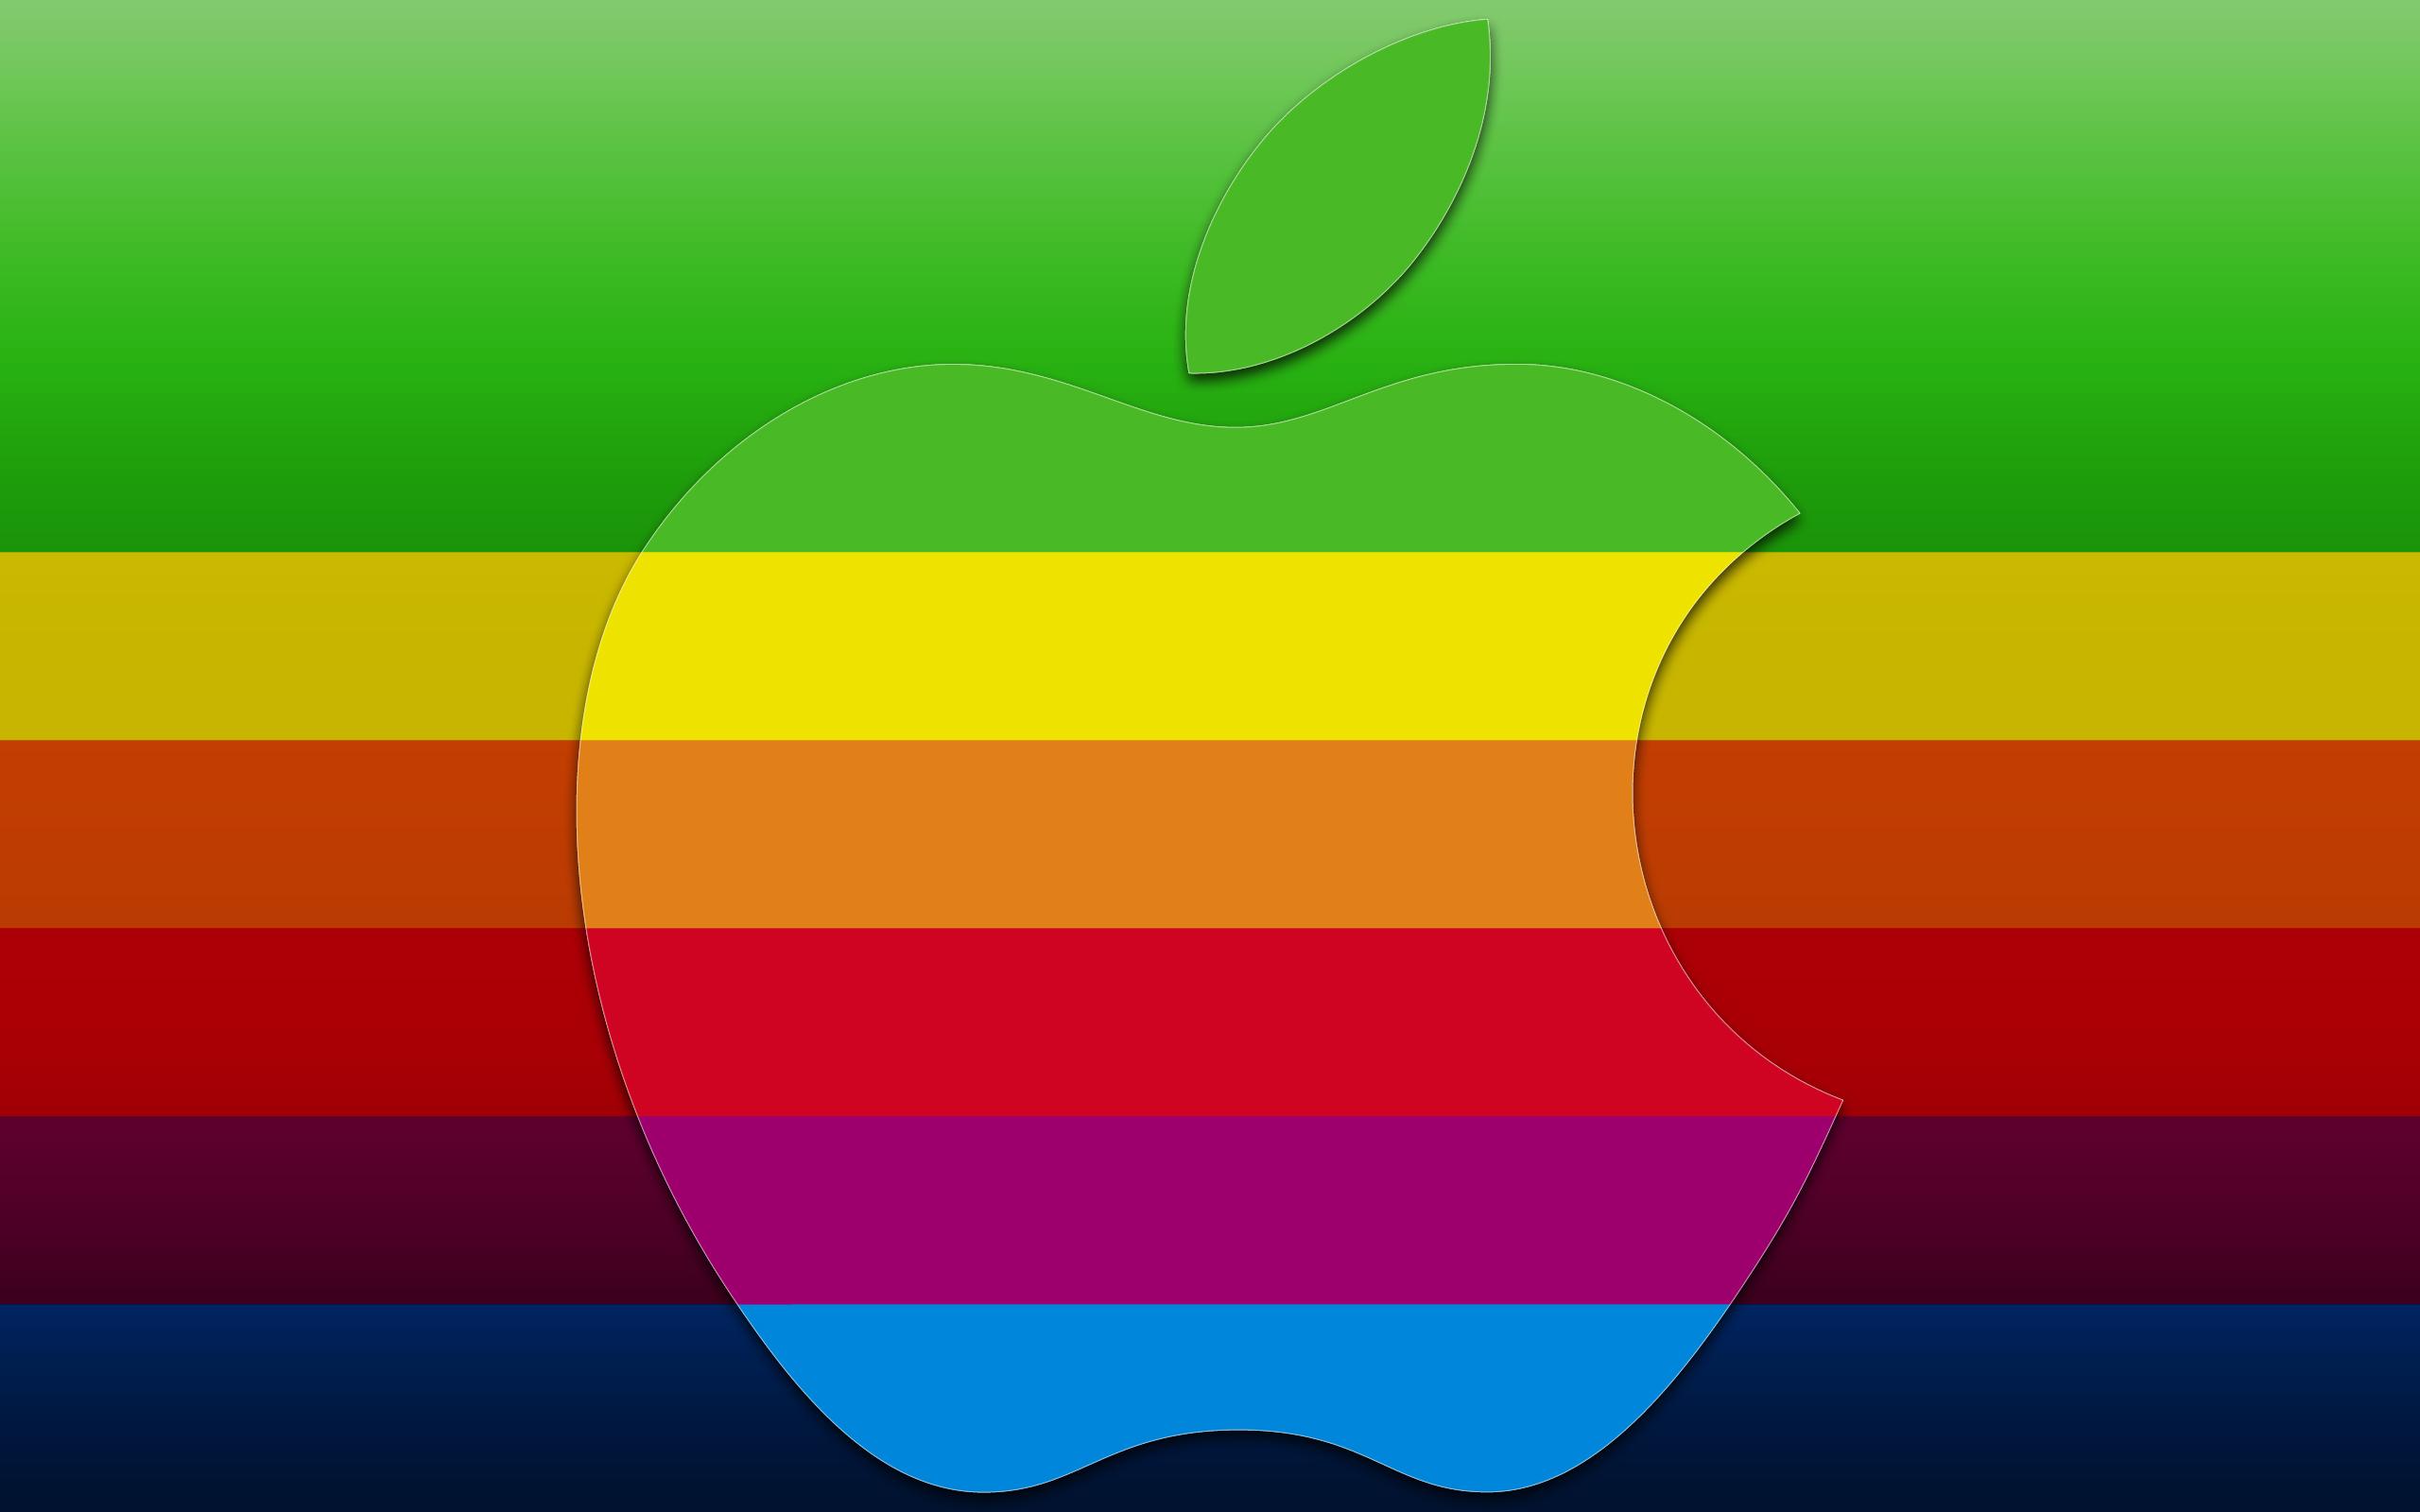 Apple_Logo1_By_Daynite_2560X1600